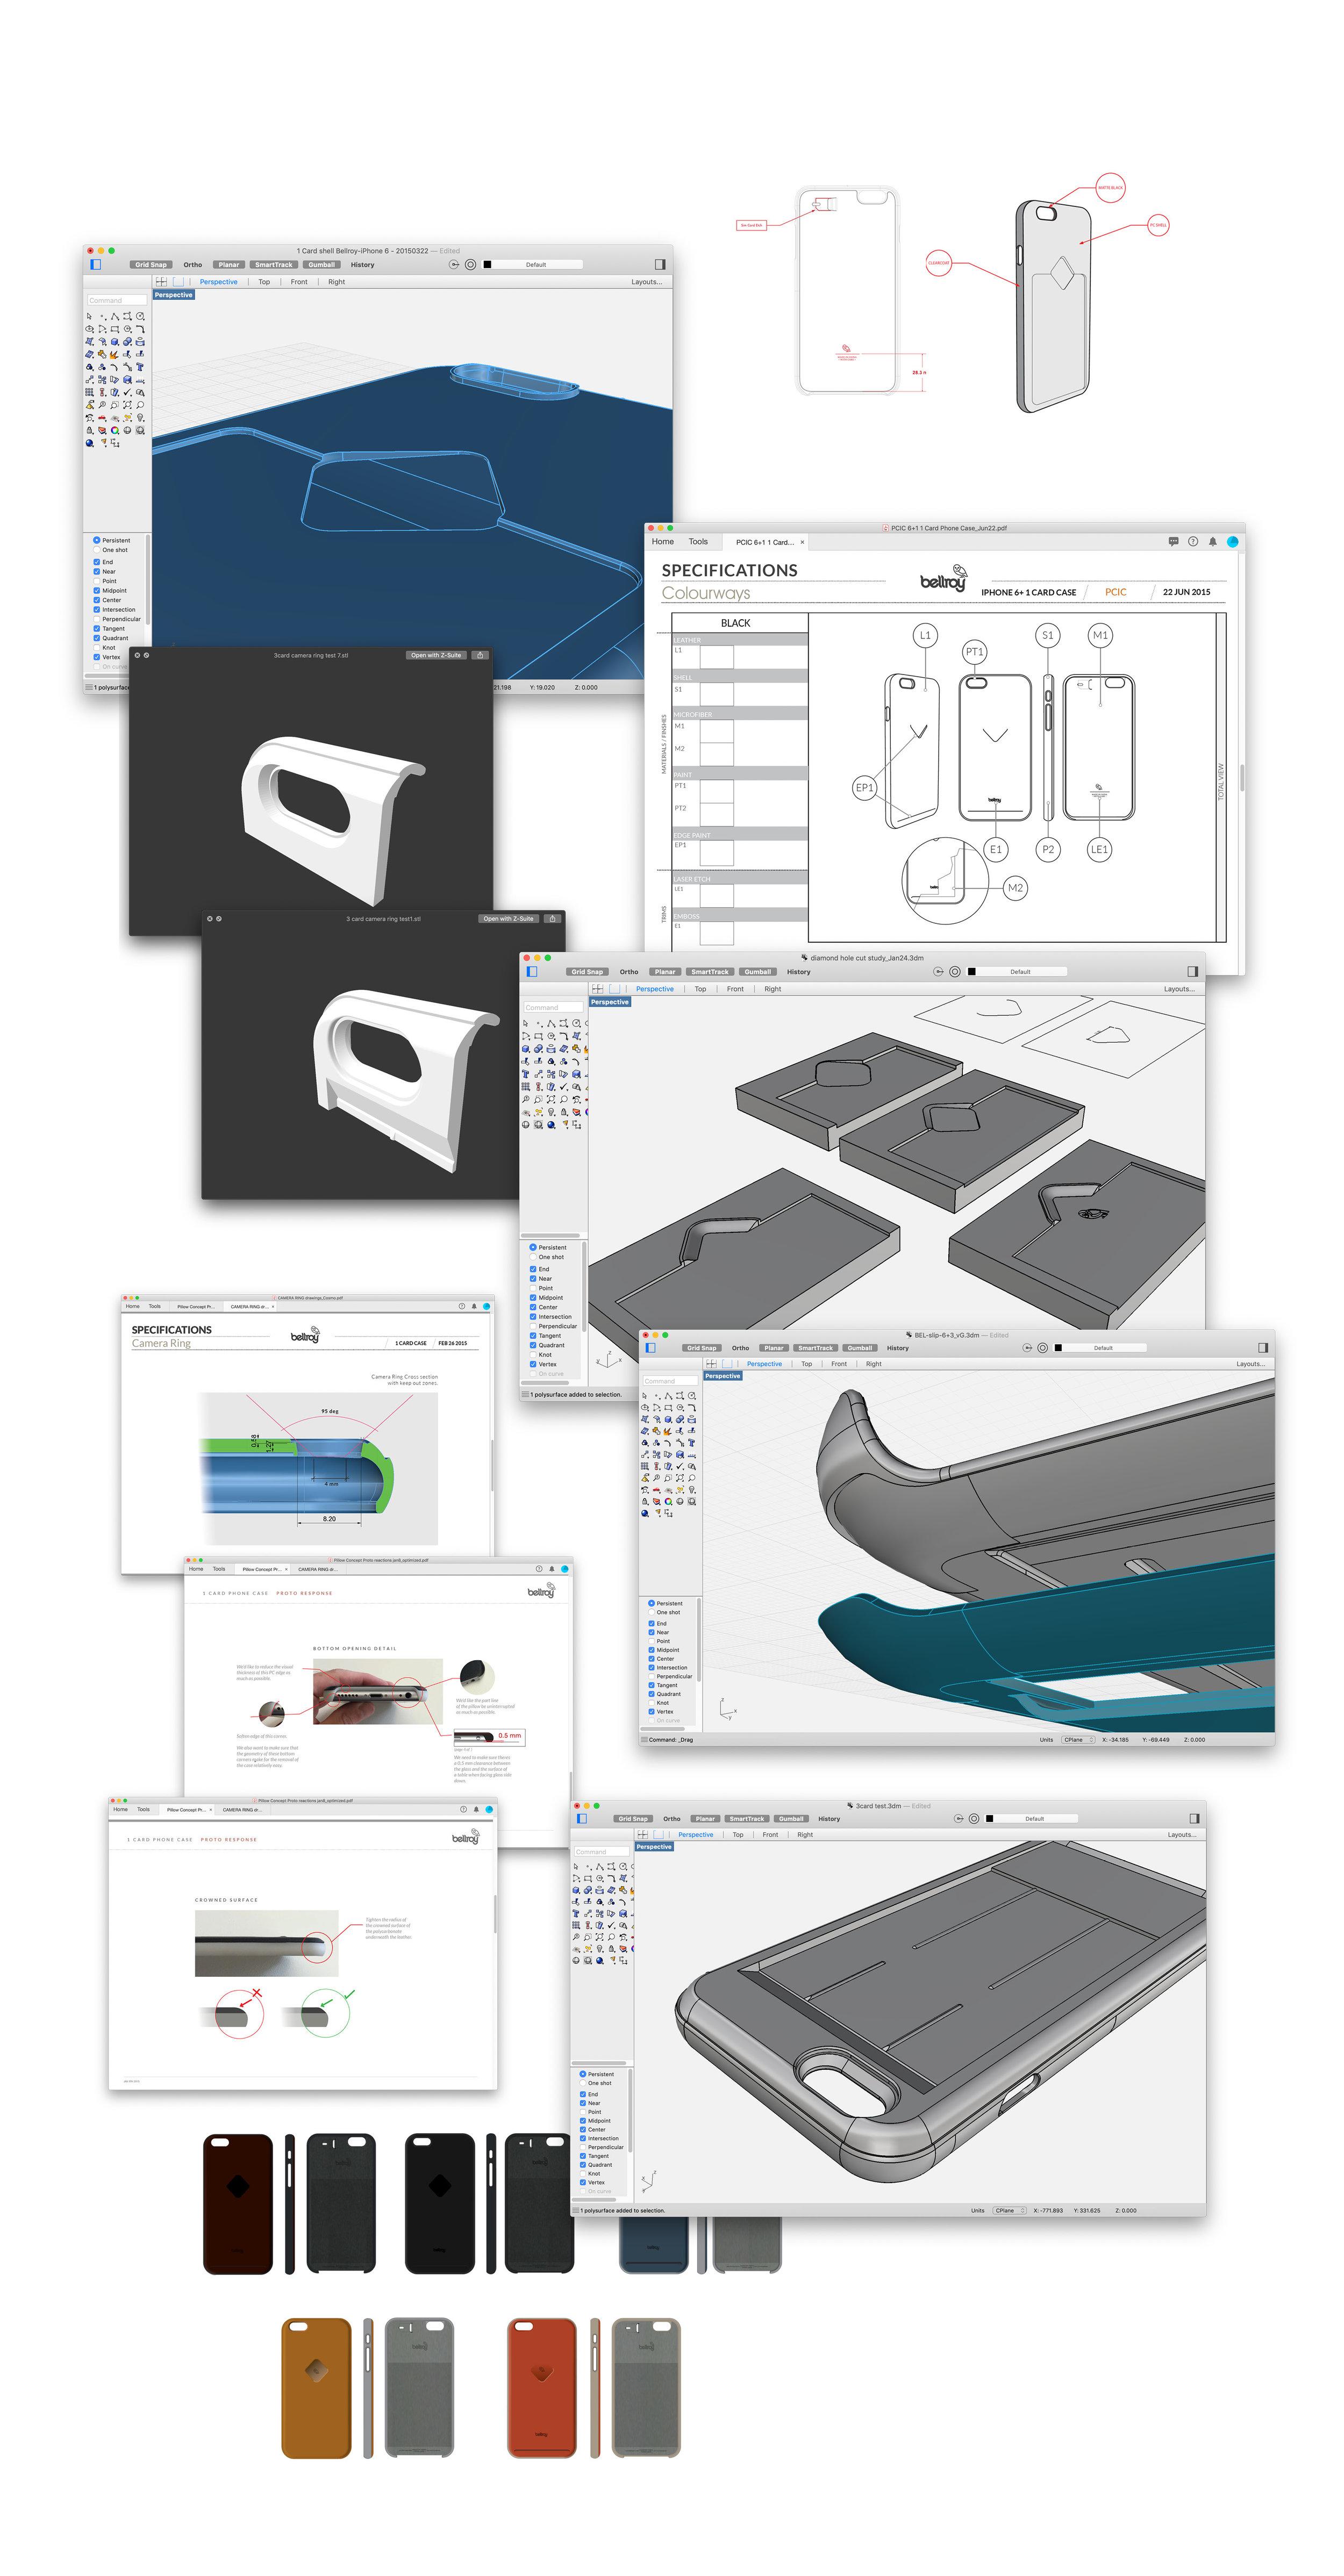 Bellroy iPhone Presentation5.jpg